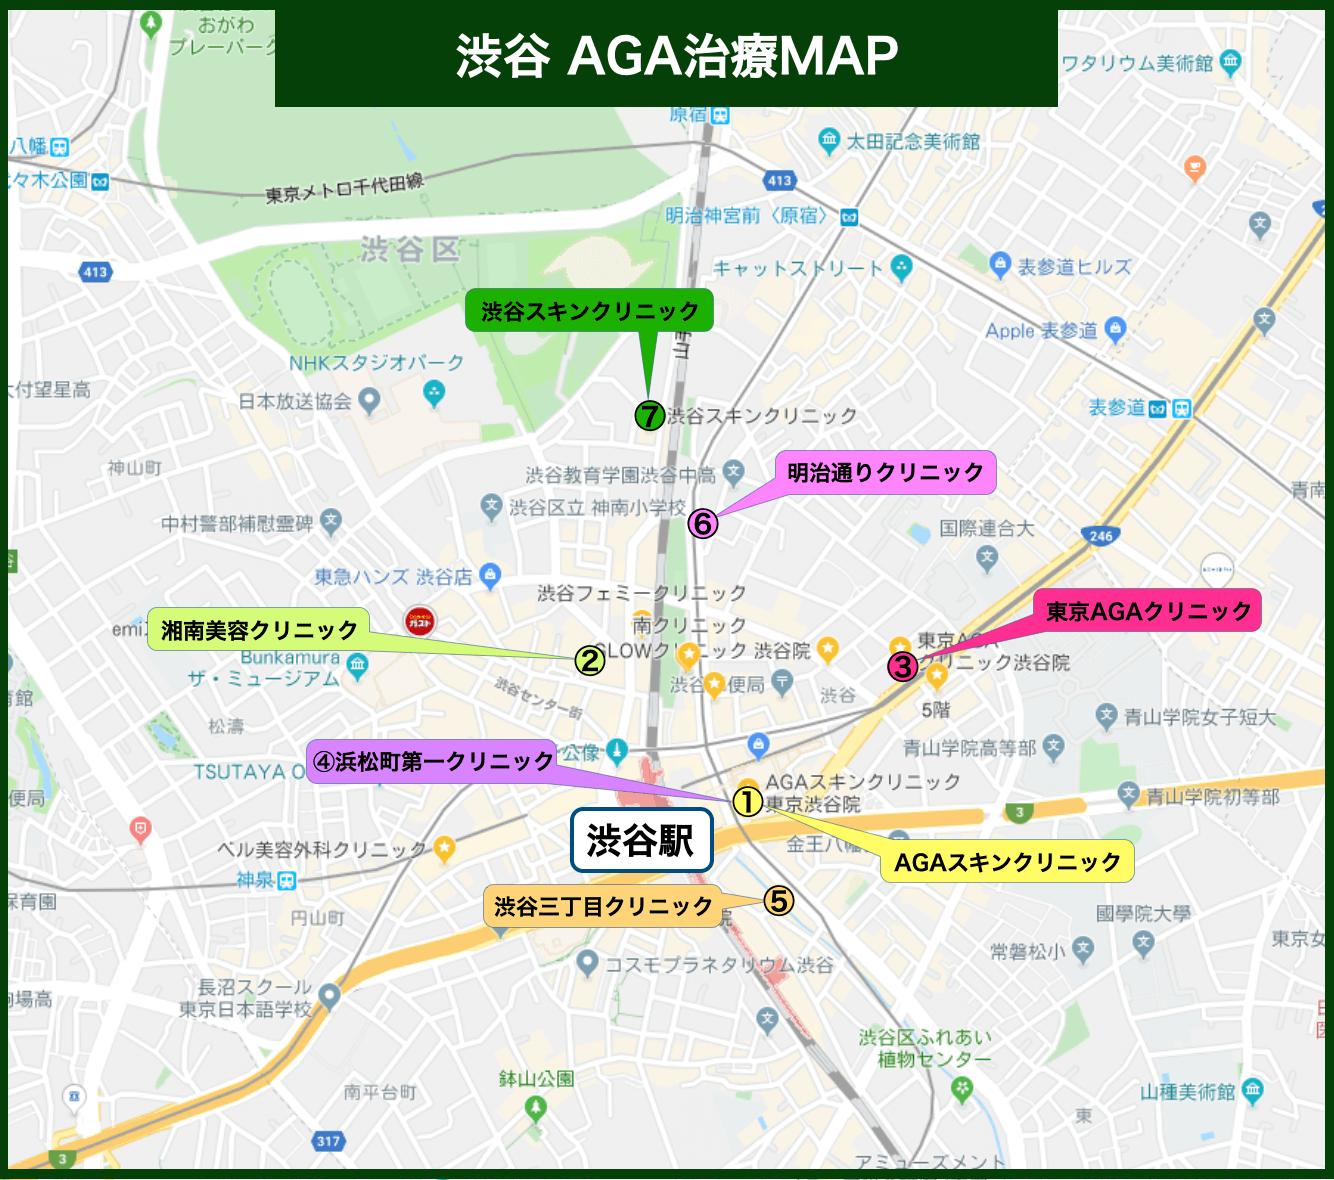 渋谷 AGA治療MAP